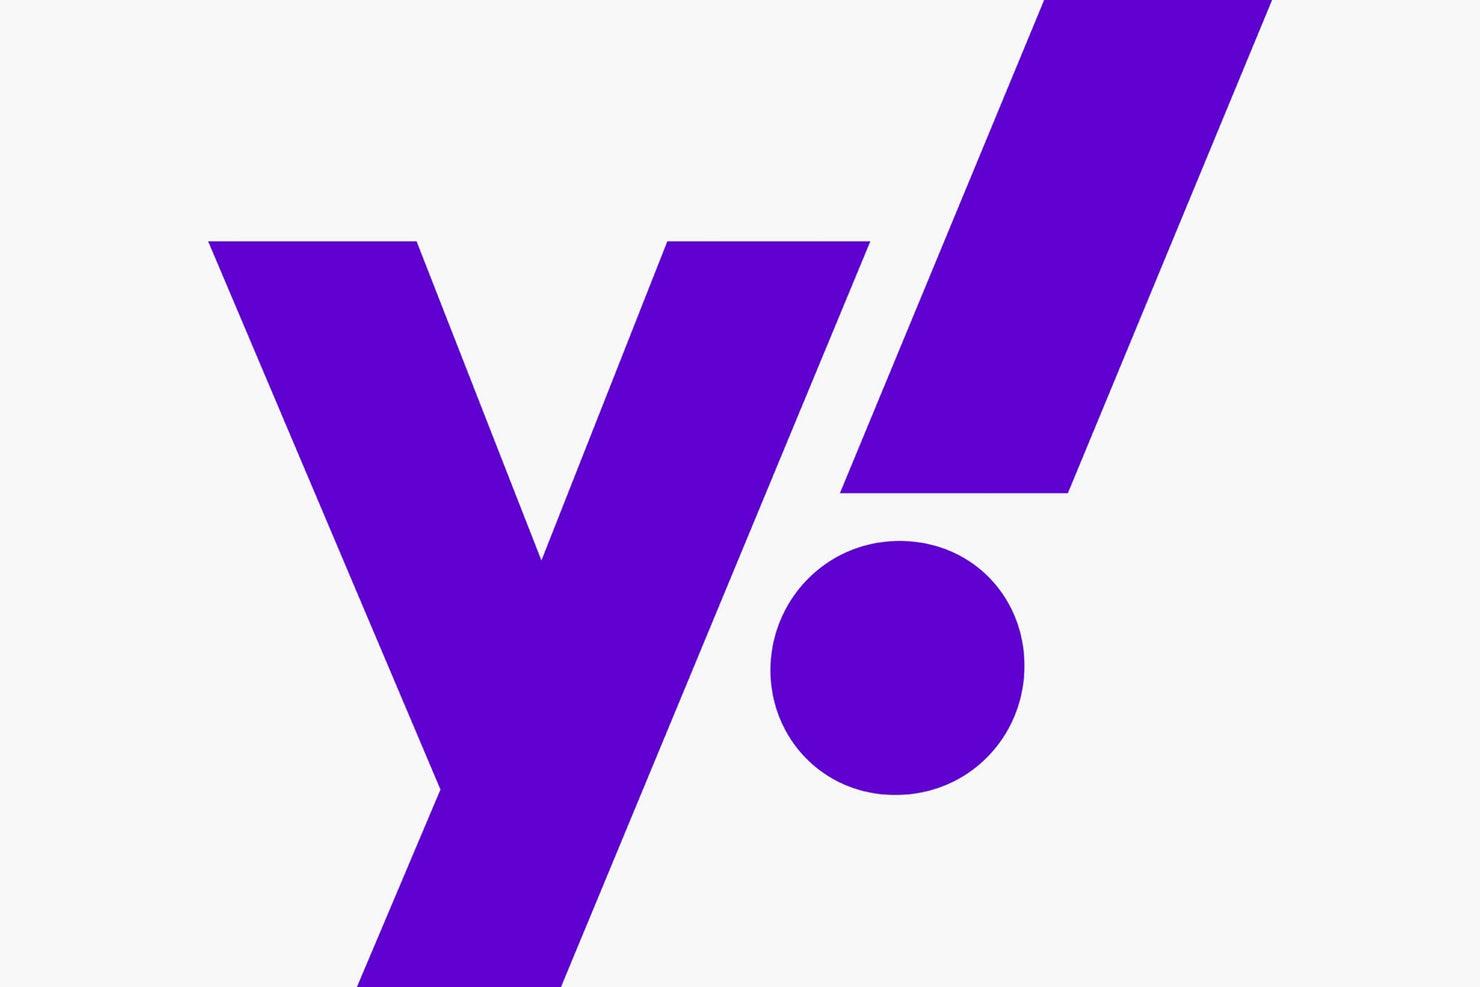 mb yahoo 03 - شناسنامه و تصاویر کامل هویت بصری جدید یاهو